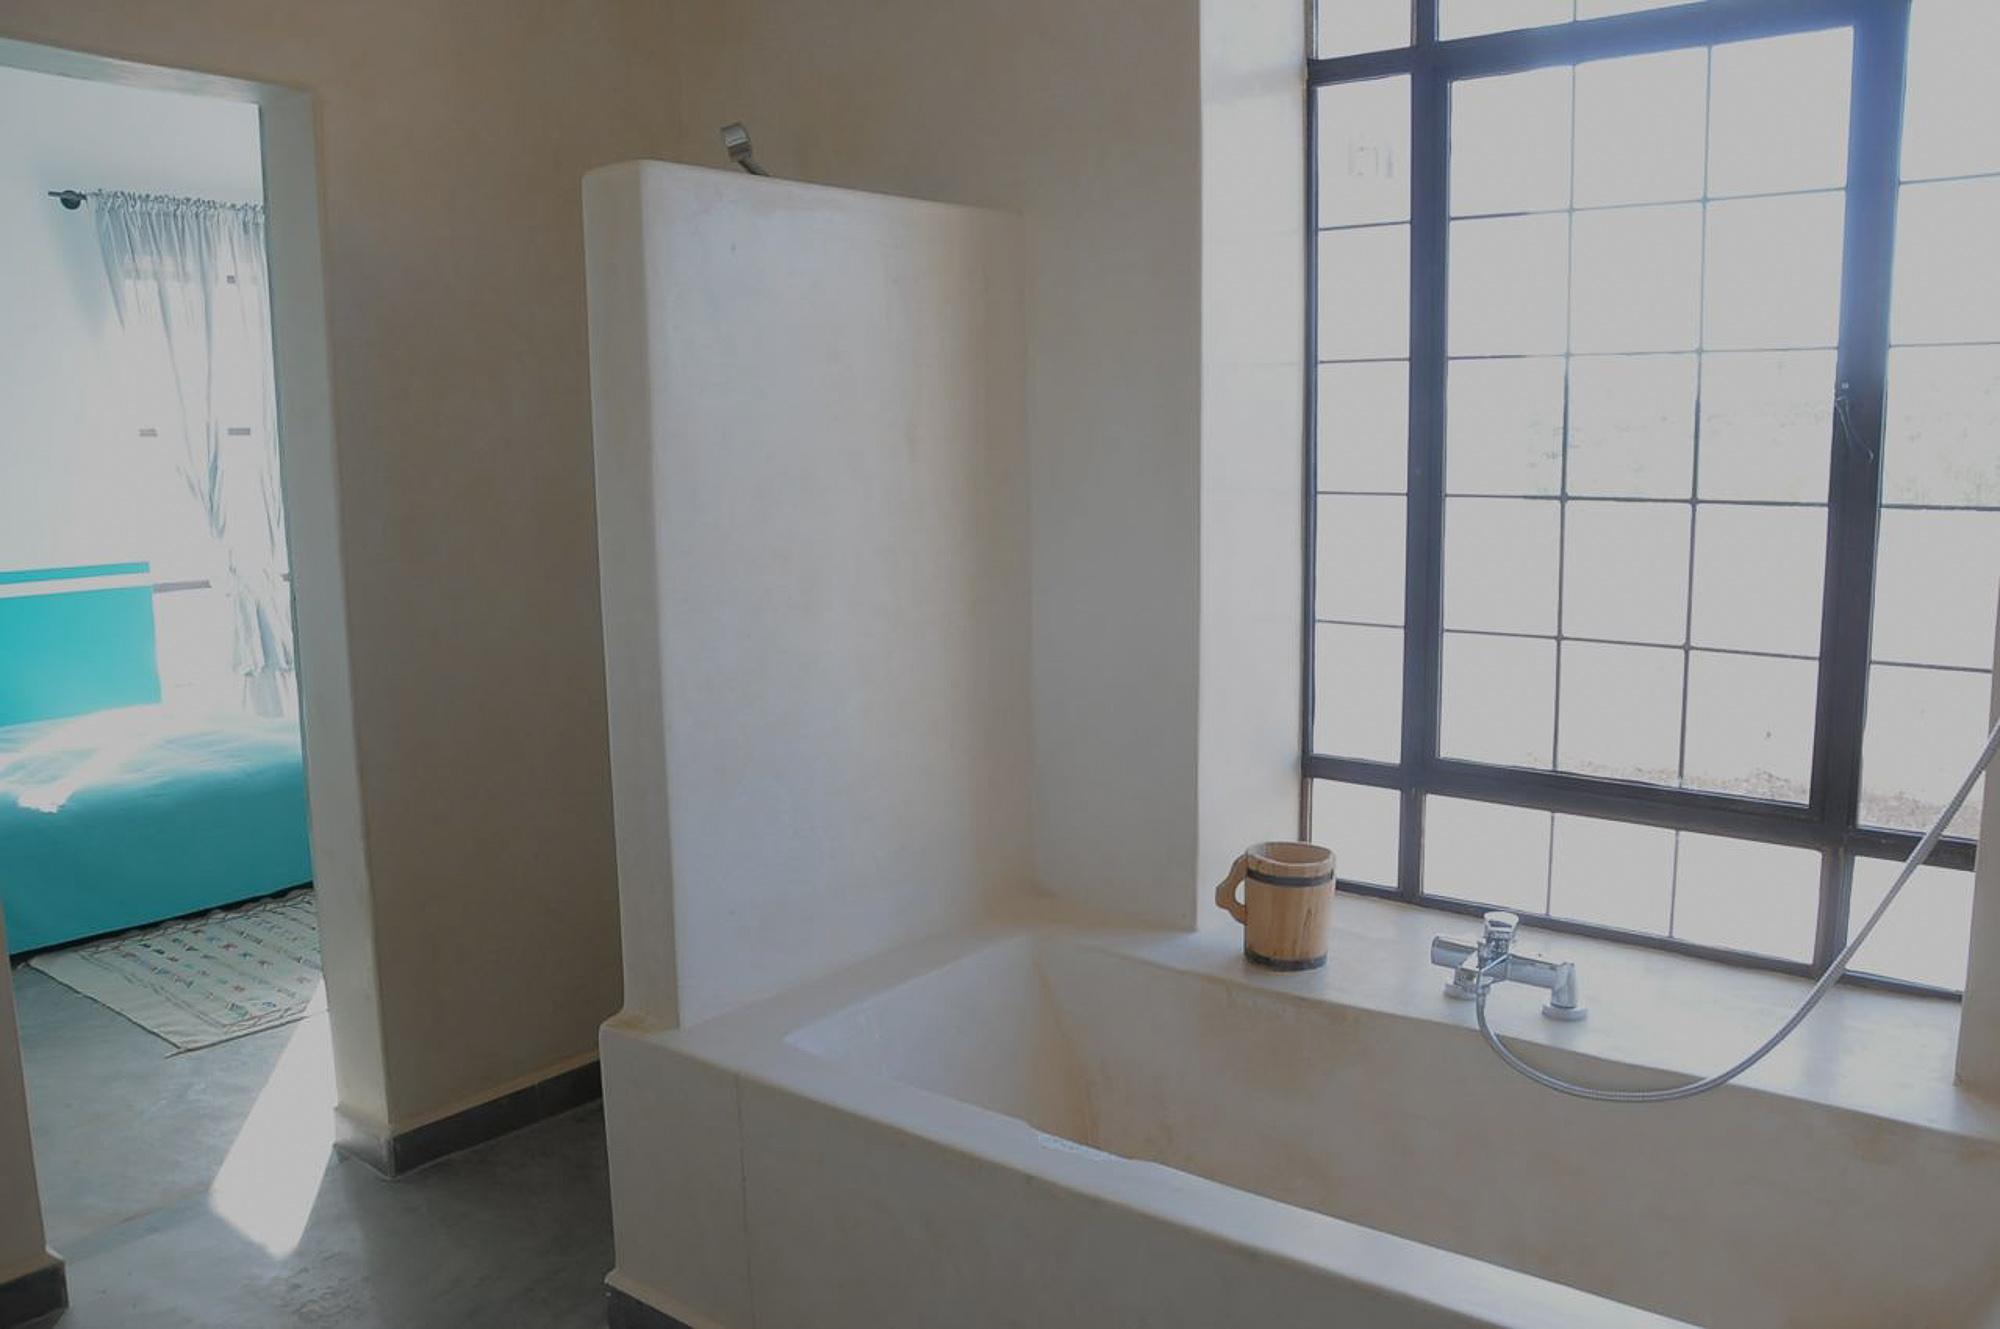 salle de bains.jpg